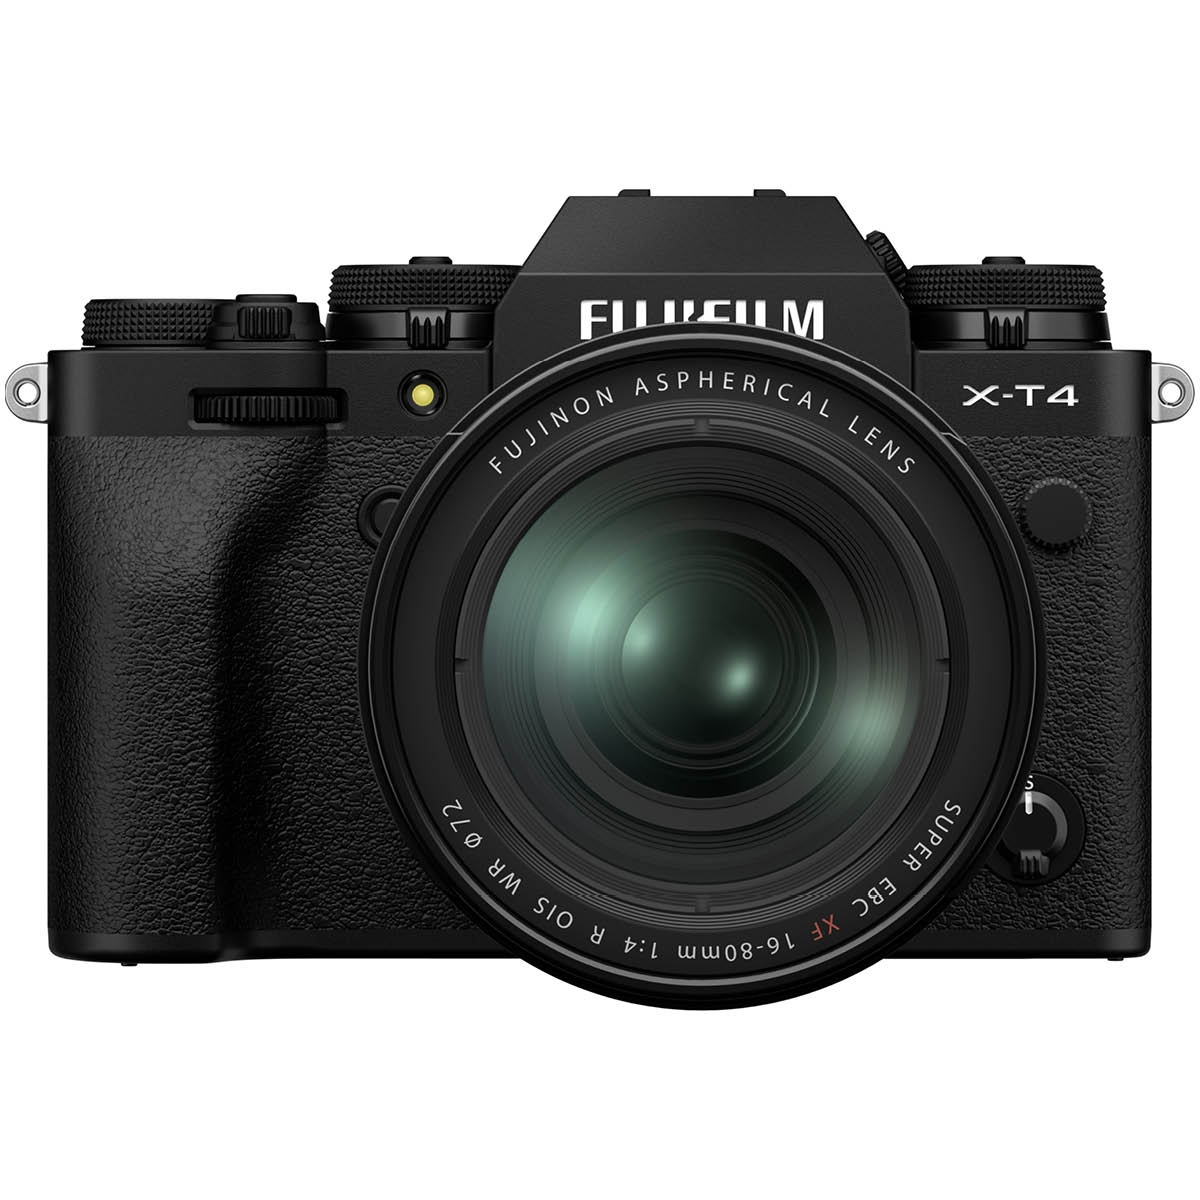 Fujifilm X T4 Kit mit 16-80 mm 1:4,0 Schwarz